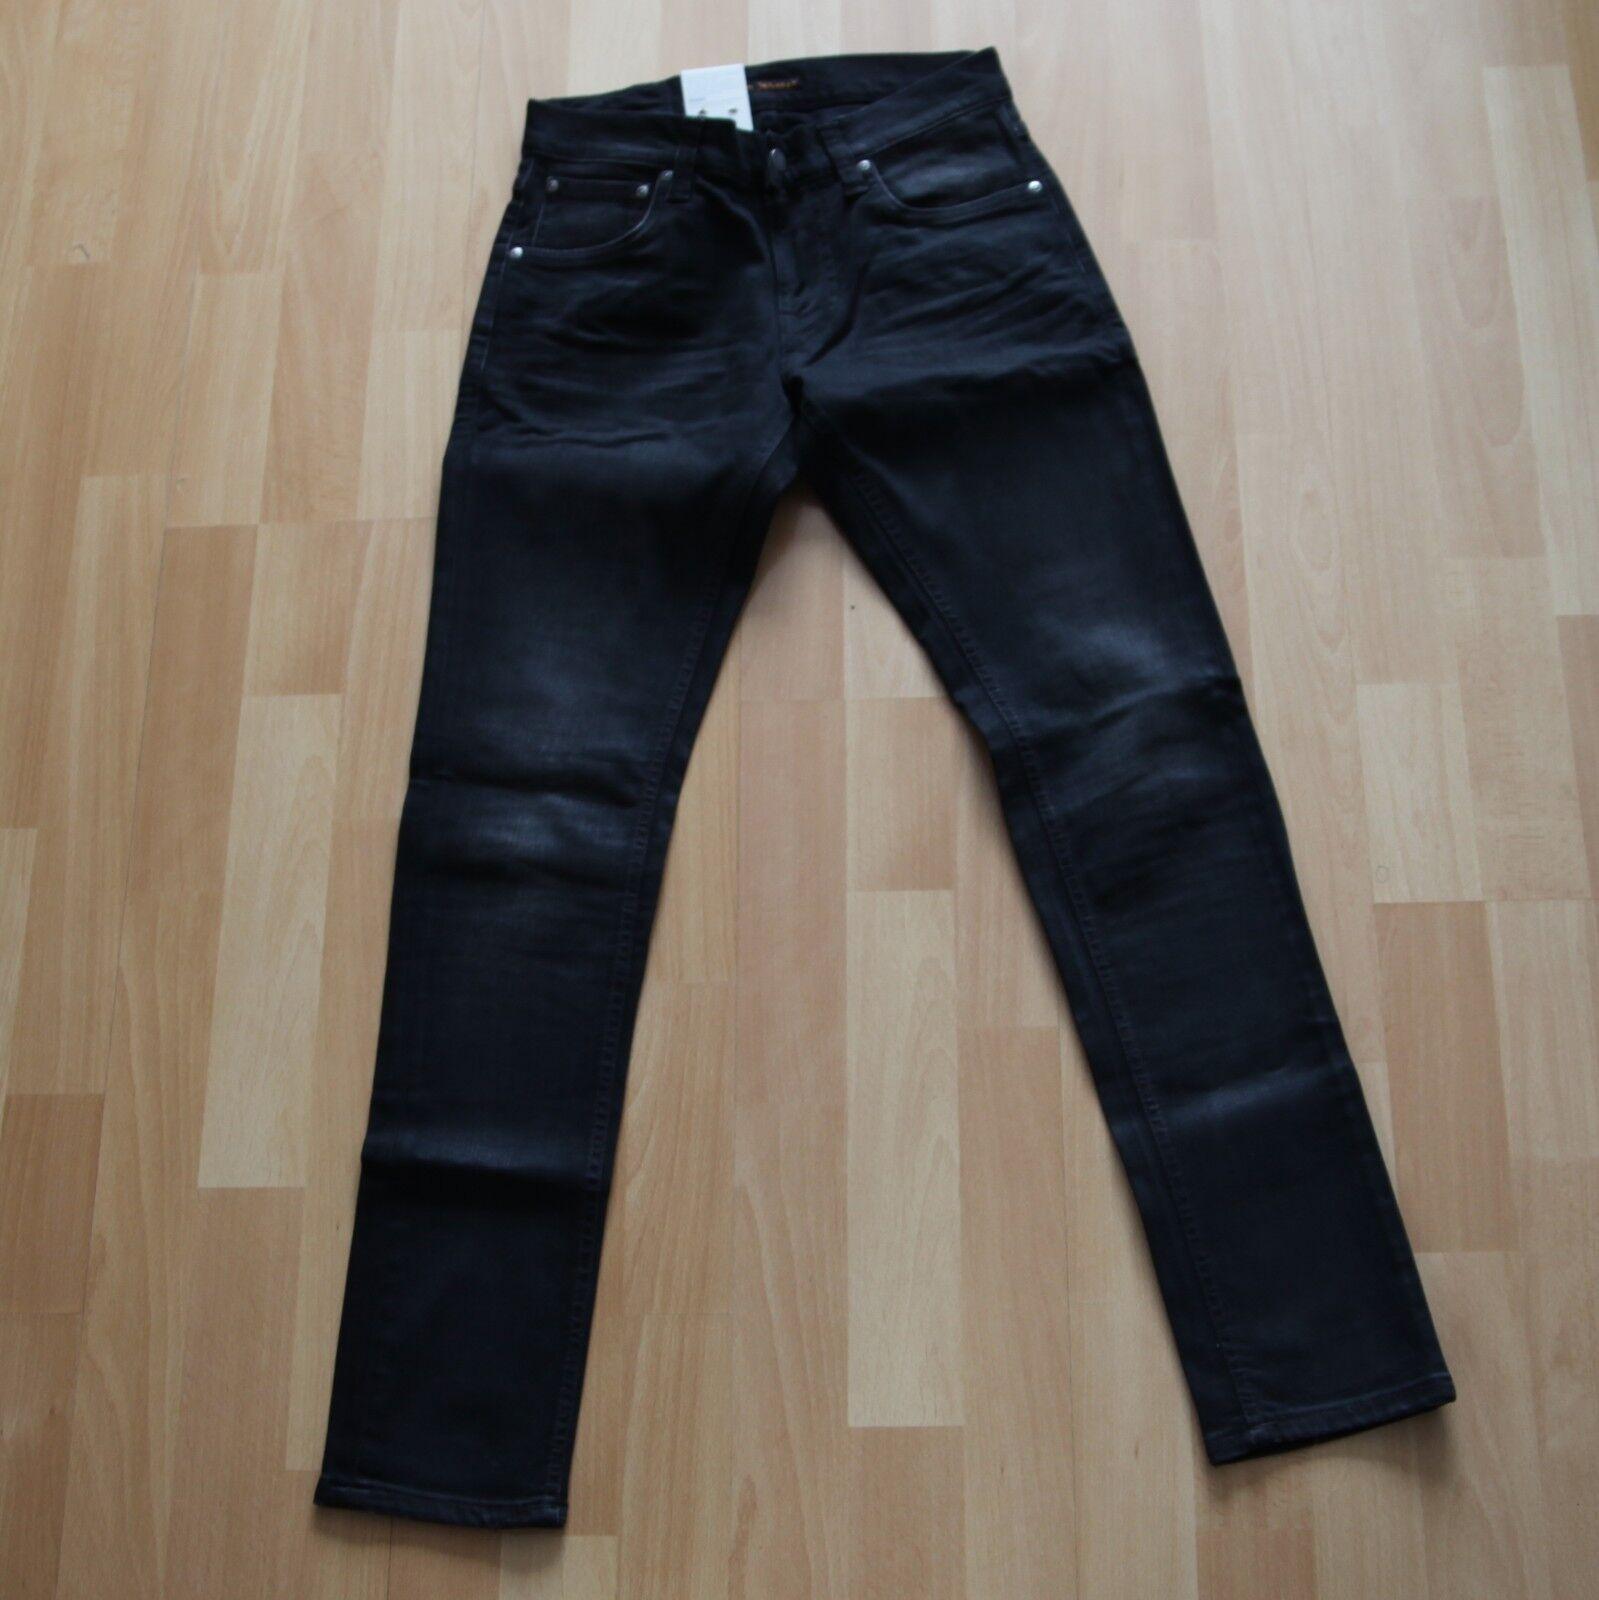 NEU Nudie Jeans Tight Terry (Tight Antifit) Authentic schwarz 28 32